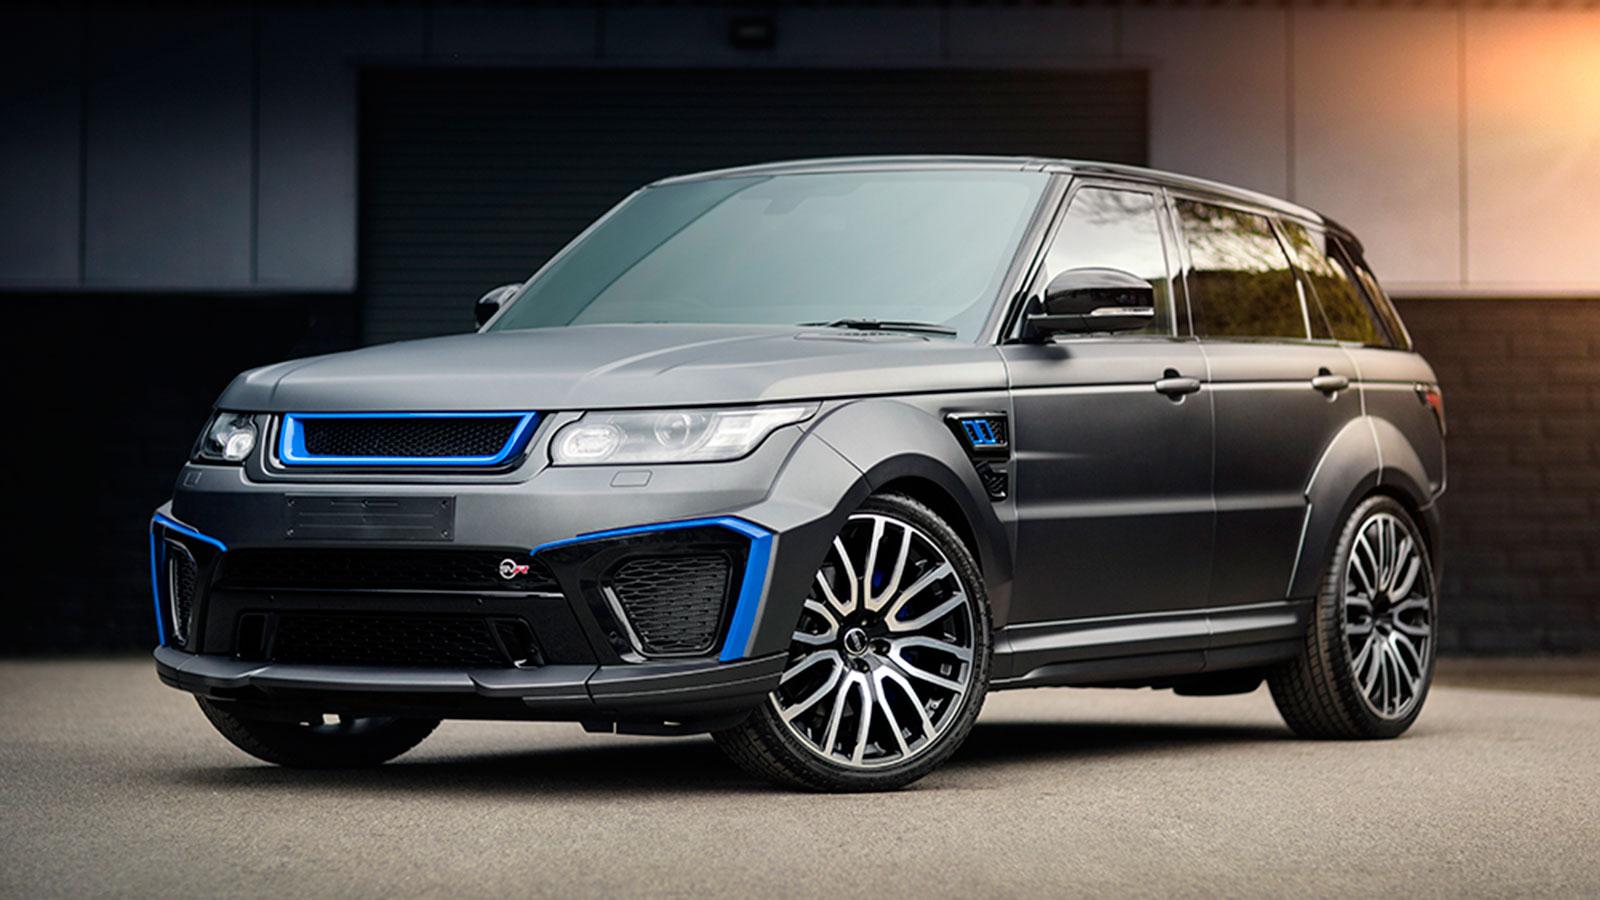 Project Kahn Land Rover Sport 5 0 V8 Supercharged Svr Pace